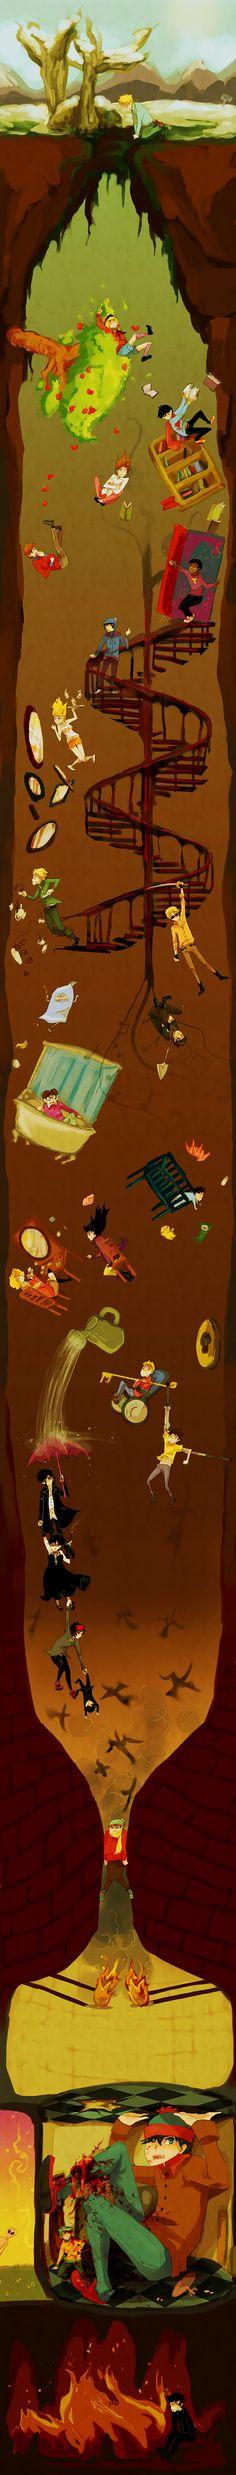 Tags: South Park, Stanley Randall Marsh, Kenneth McCormick, Phillip Pirrup, Leopold Stotch, Kyle Broflovski, Eric Theodore Cartman, Wendy Testaburger, Tweek Tweak, Craig Tucker, Token Williams, Bebe Stevens, Gregory, Clyde Donovan, Ike Broflovski, Timmy, Firkle, Towelie, Shelley Marsh, Damien, Mole (South Park), Kevin Stoley, Goth Kids, Kyle Schwartz, Michael (South Park)